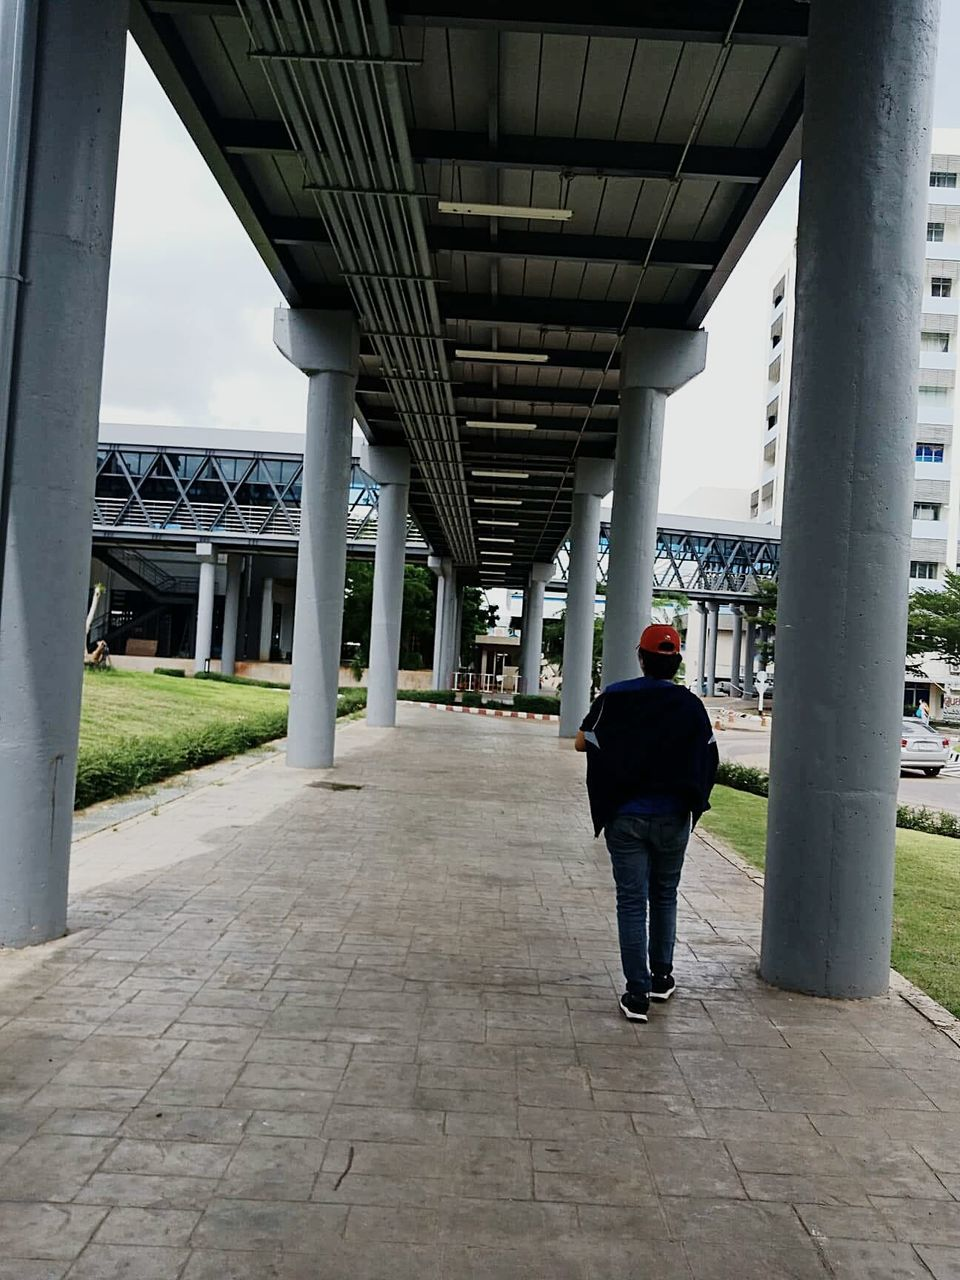 FULL LENGTH REAR VIEW OF MAN STANDING ON BRIDGE